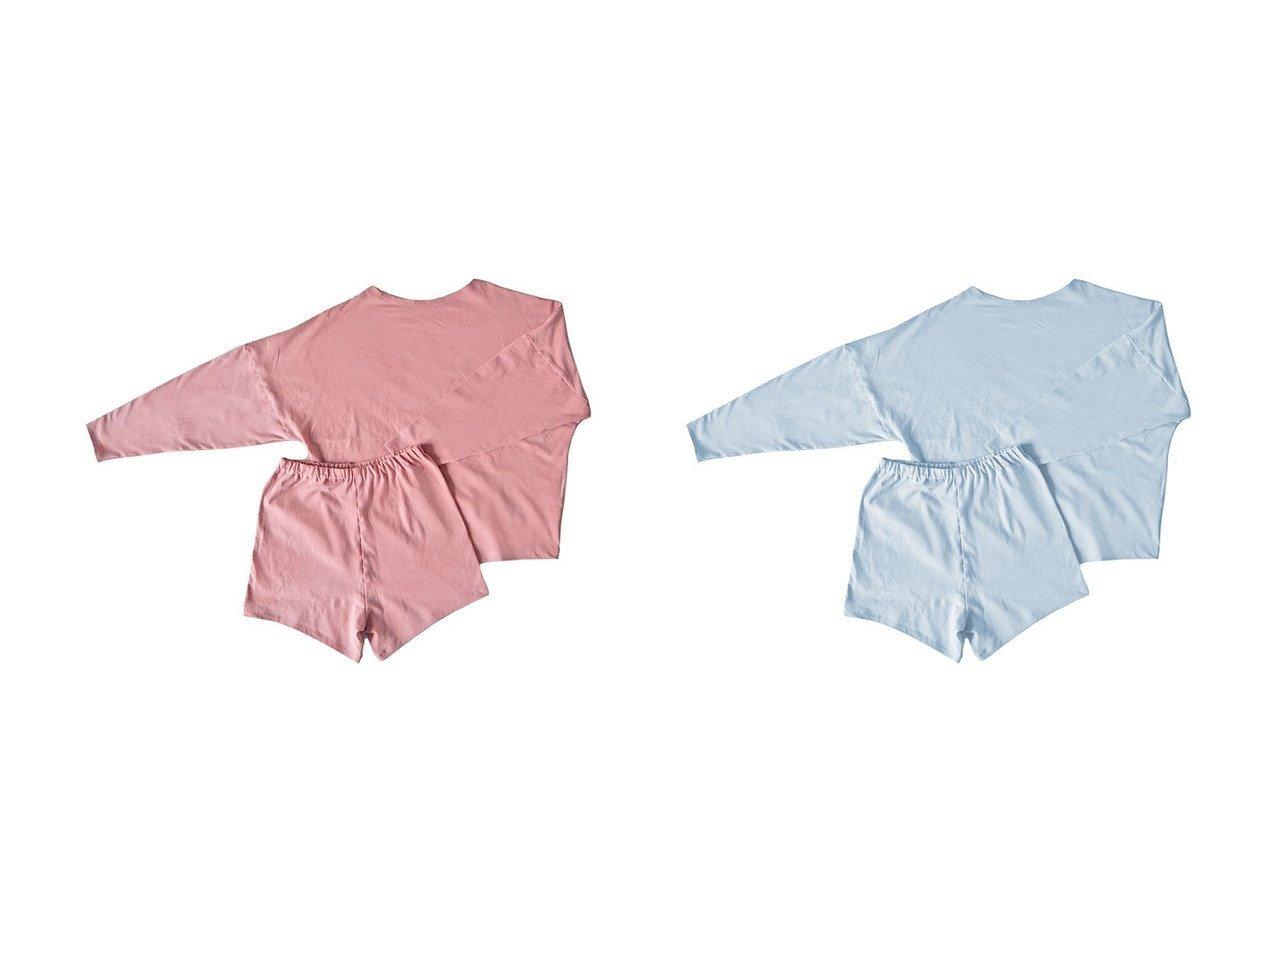 【Women's Health/ウィメンズヘルス】のlight sleeper【hazelle】 おすすめ!人気、トレンド・レディースファッションの通販  おすすめで人気の流行・トレンド、ファッションの通販商品 インテリア・家具・メンズファッション・キッズファッション・レディースファッション・服の通販 founy(ファニー) https://founy.com/ ファッション Fashion レディースファッション WOMEN 下着・ランジェリー Underwear その他インナー・ランジェリー Other lingerie ショーツ ストレッチ スリーブ ランジェリー リラックス 再入荷 Restock/Back in Stock/Re Arrival  ID:crp329100000063090